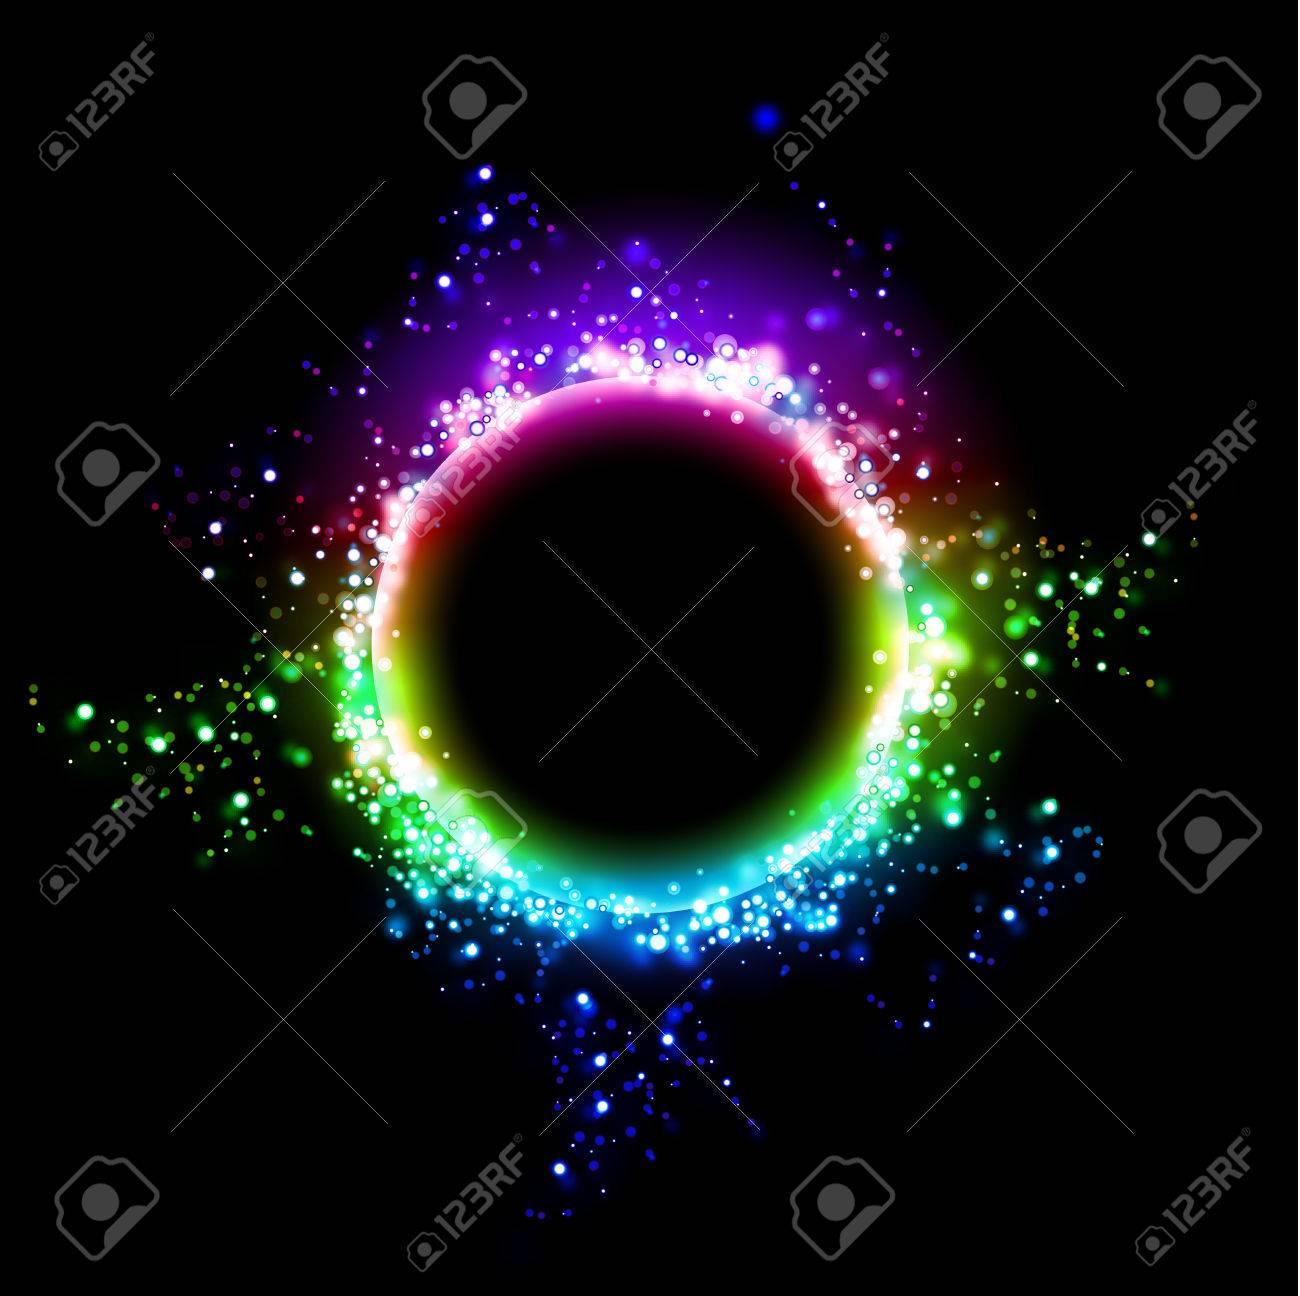 Fondo Oscuro Con Marco Redondo Brillante. Diseño Cósmico Agujero ...